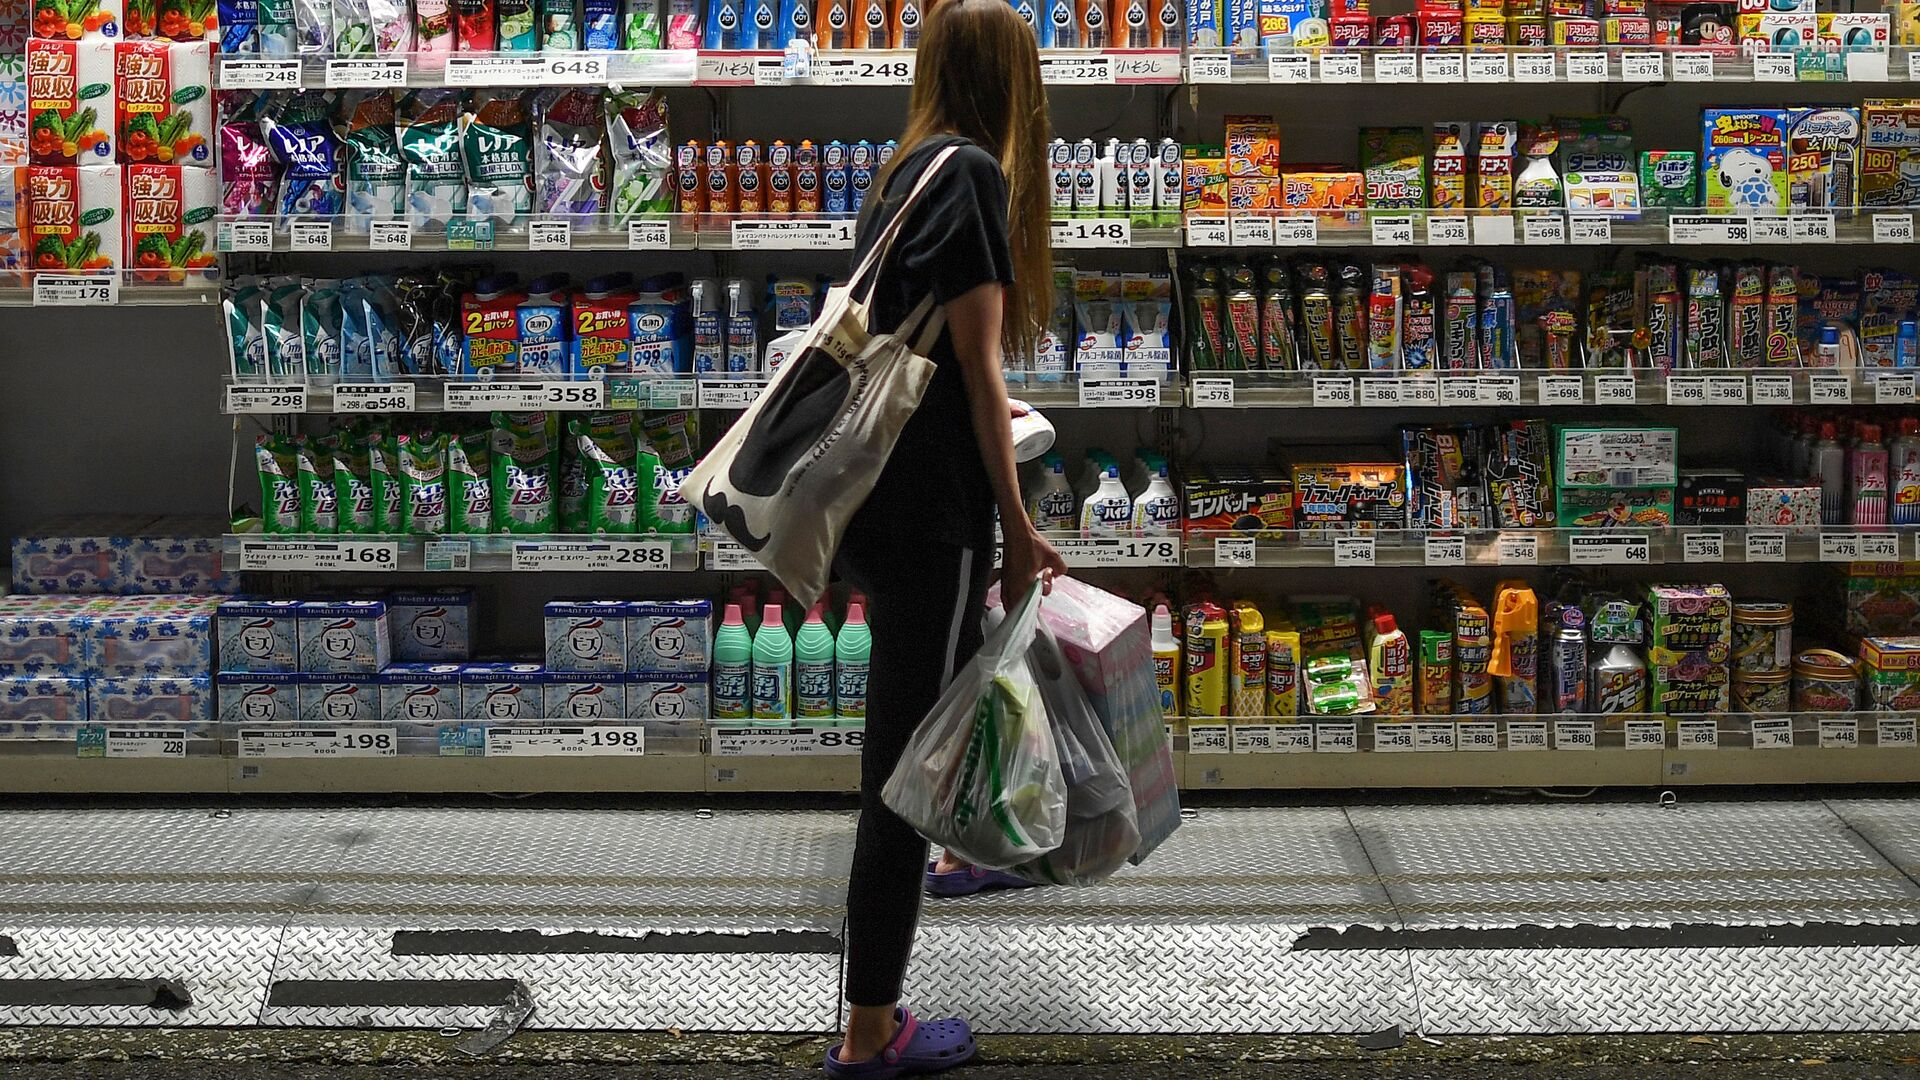 Женщина у прилавка в супермаркете, фото из архива - Sputnik Azərbaycan, 1920, 06.09.2021